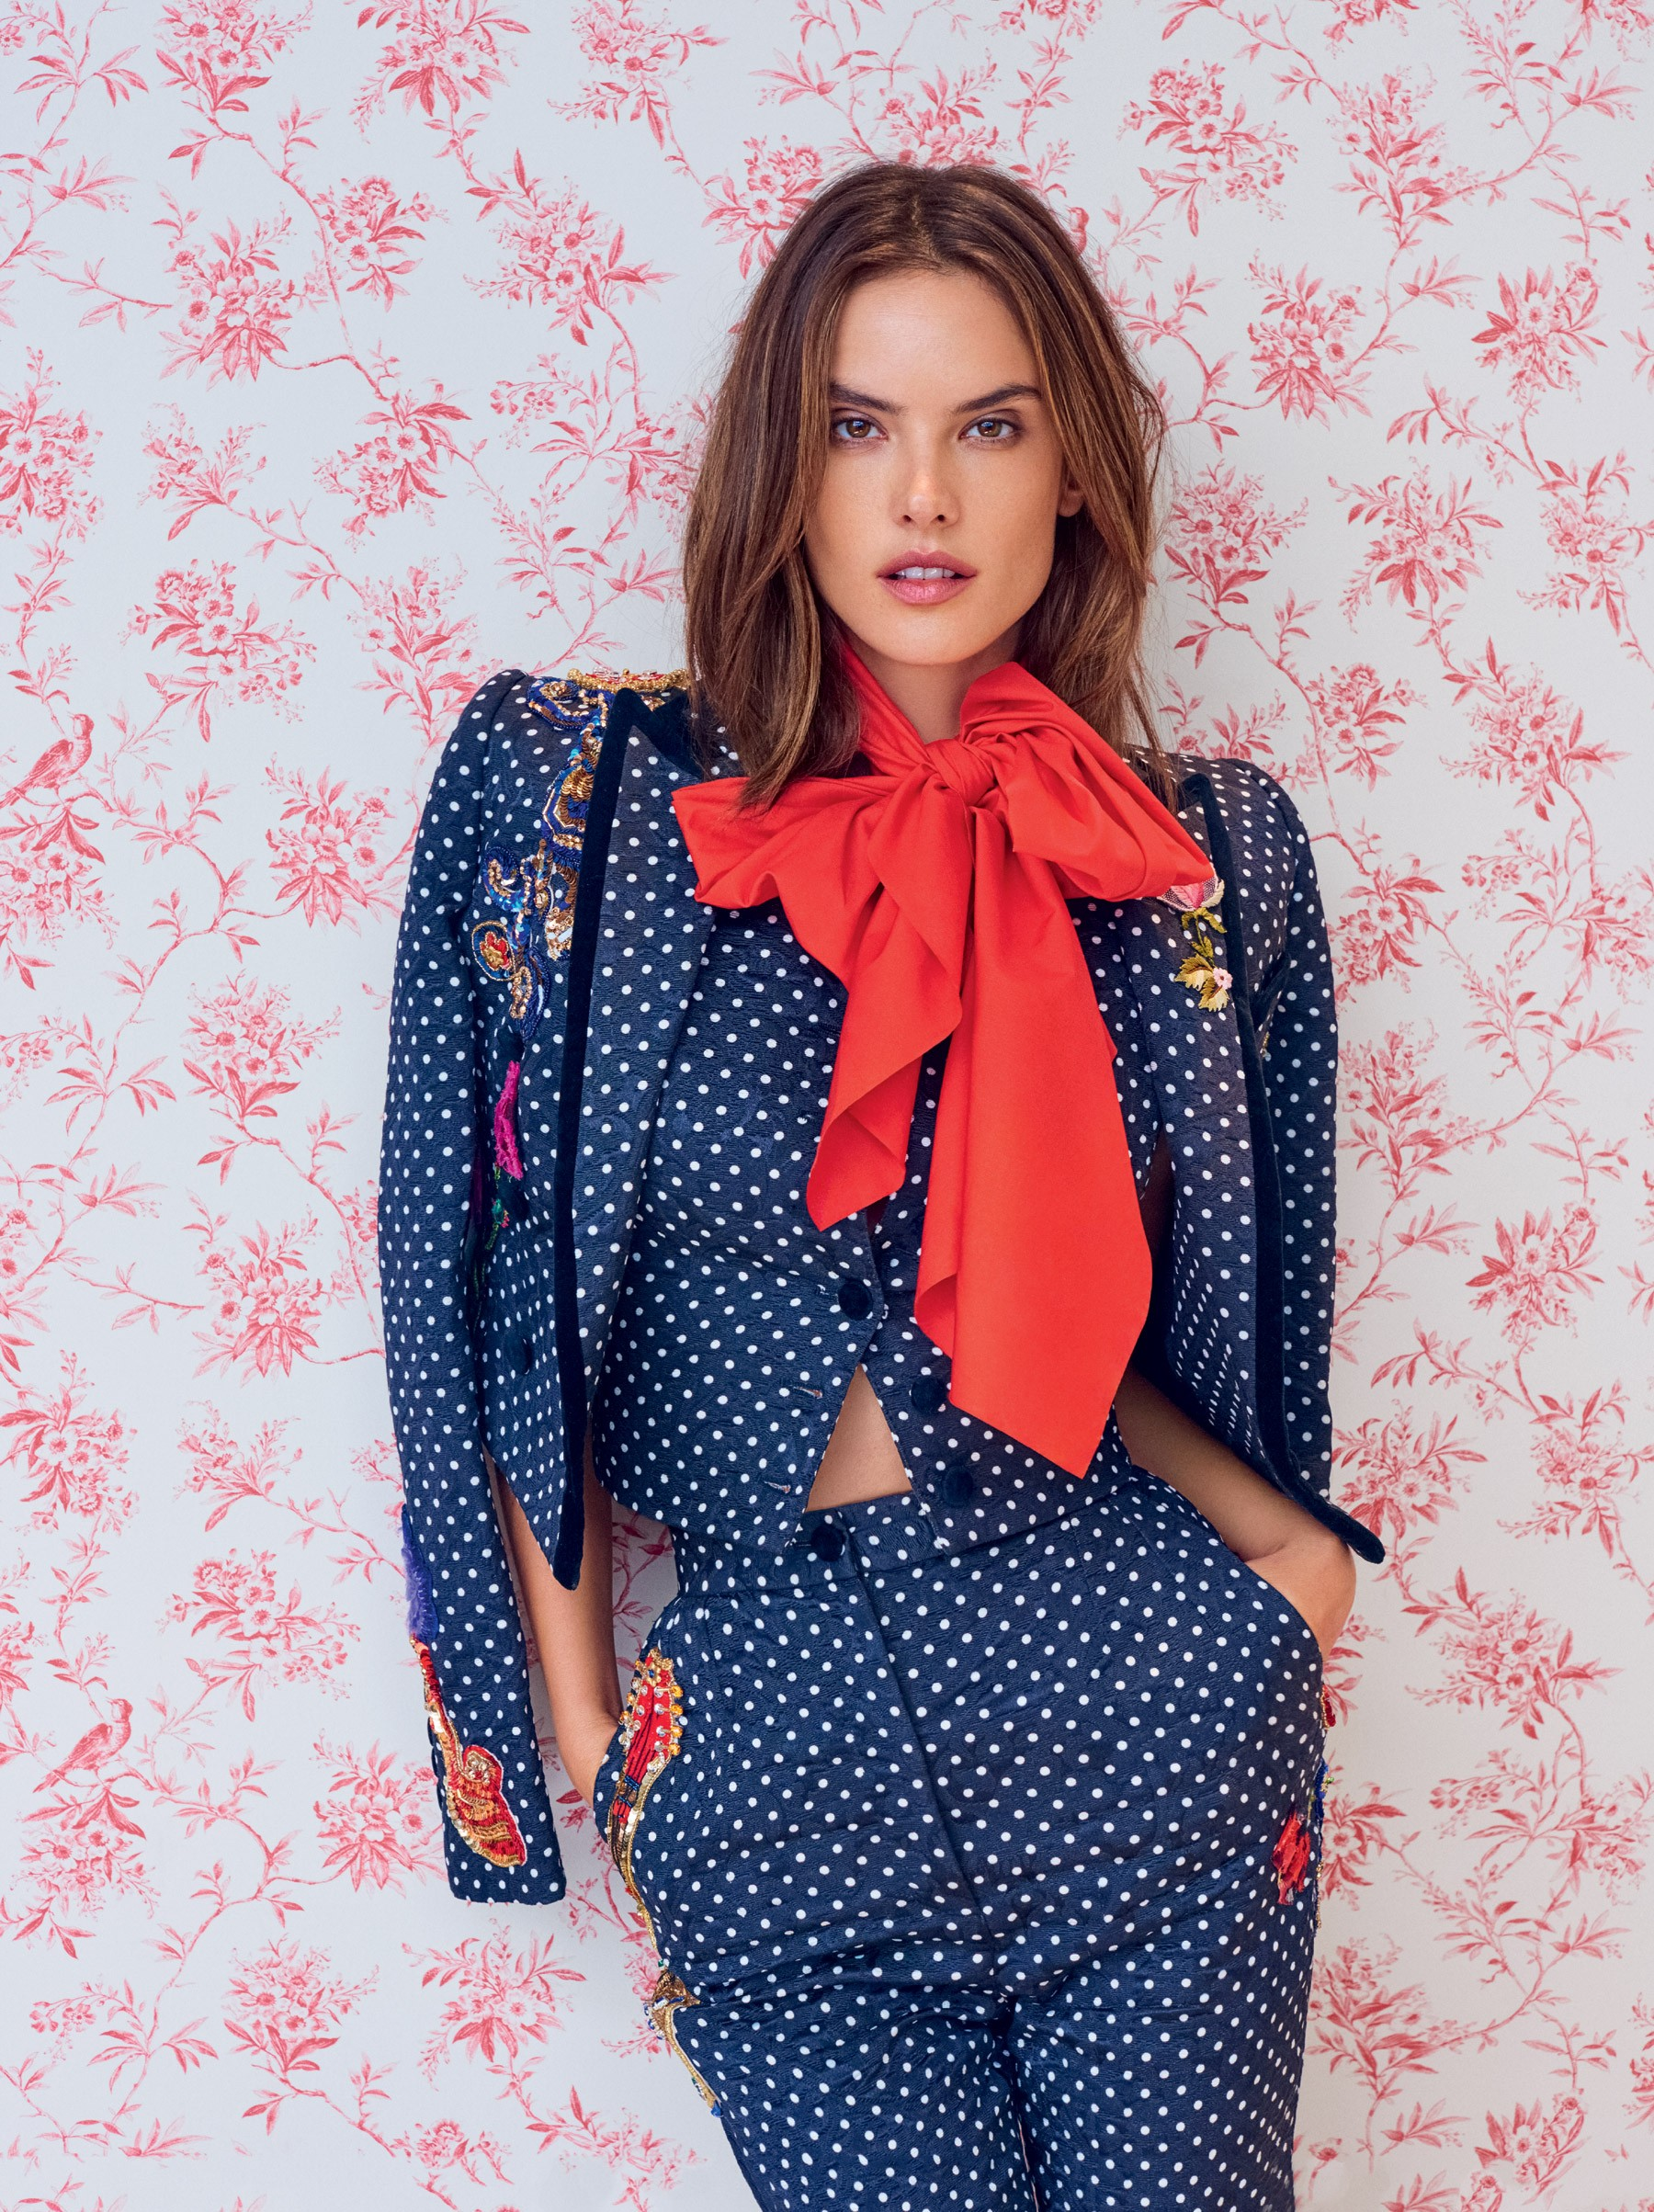 Alessandra Ambrósio na Vogue de abril (Foto: Vogue Brasil)